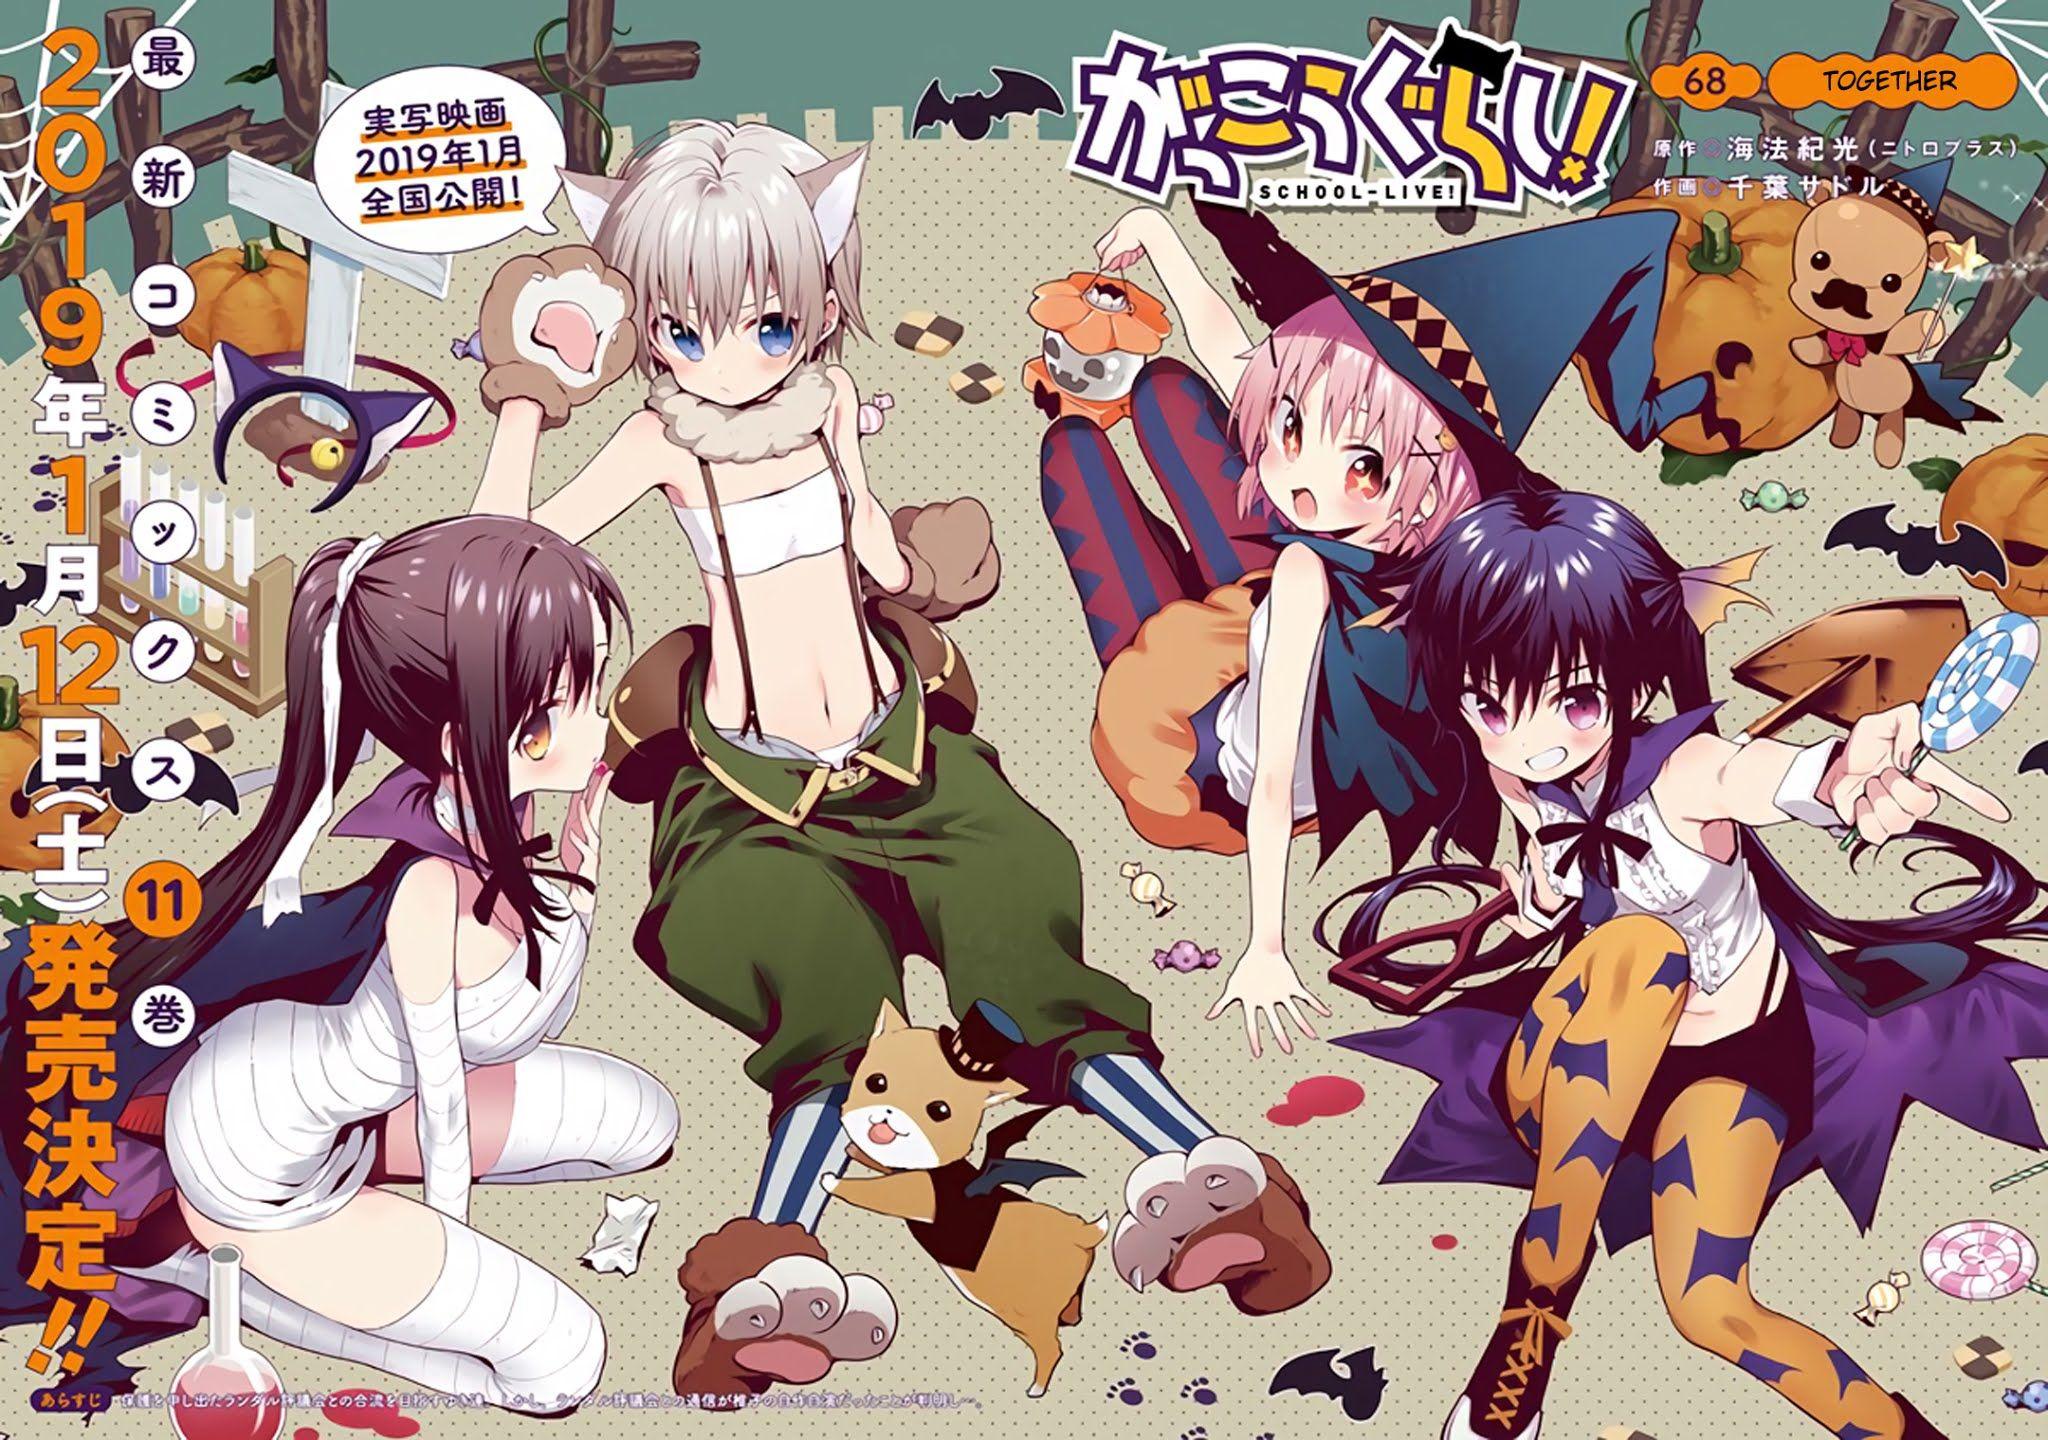 Read manga Gakkou Gurashi! Ch.068 Together online in